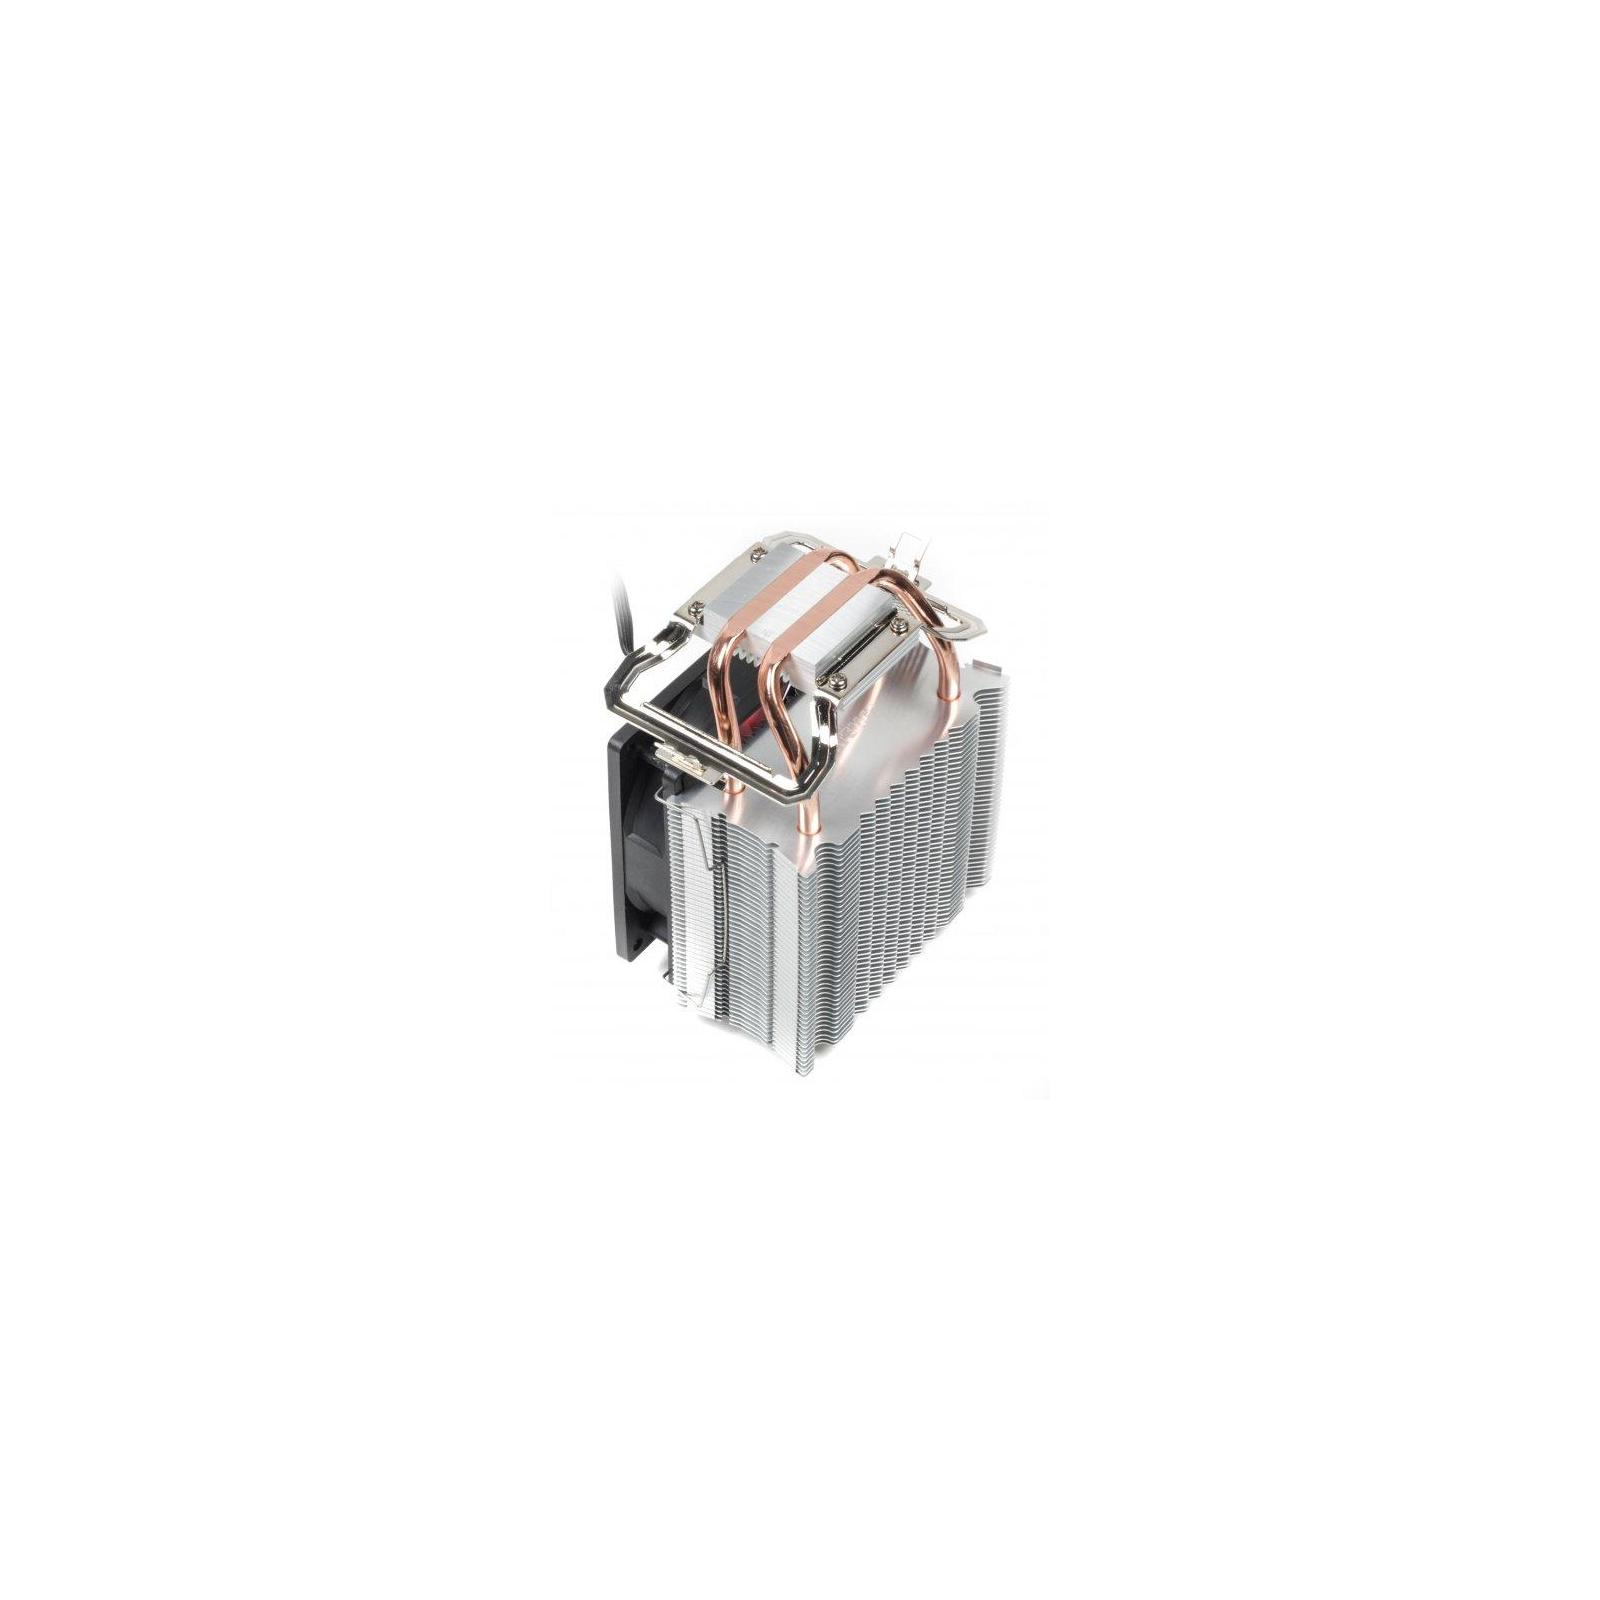 Кулер для процессора Xilence A402 (XC025) изображение 2